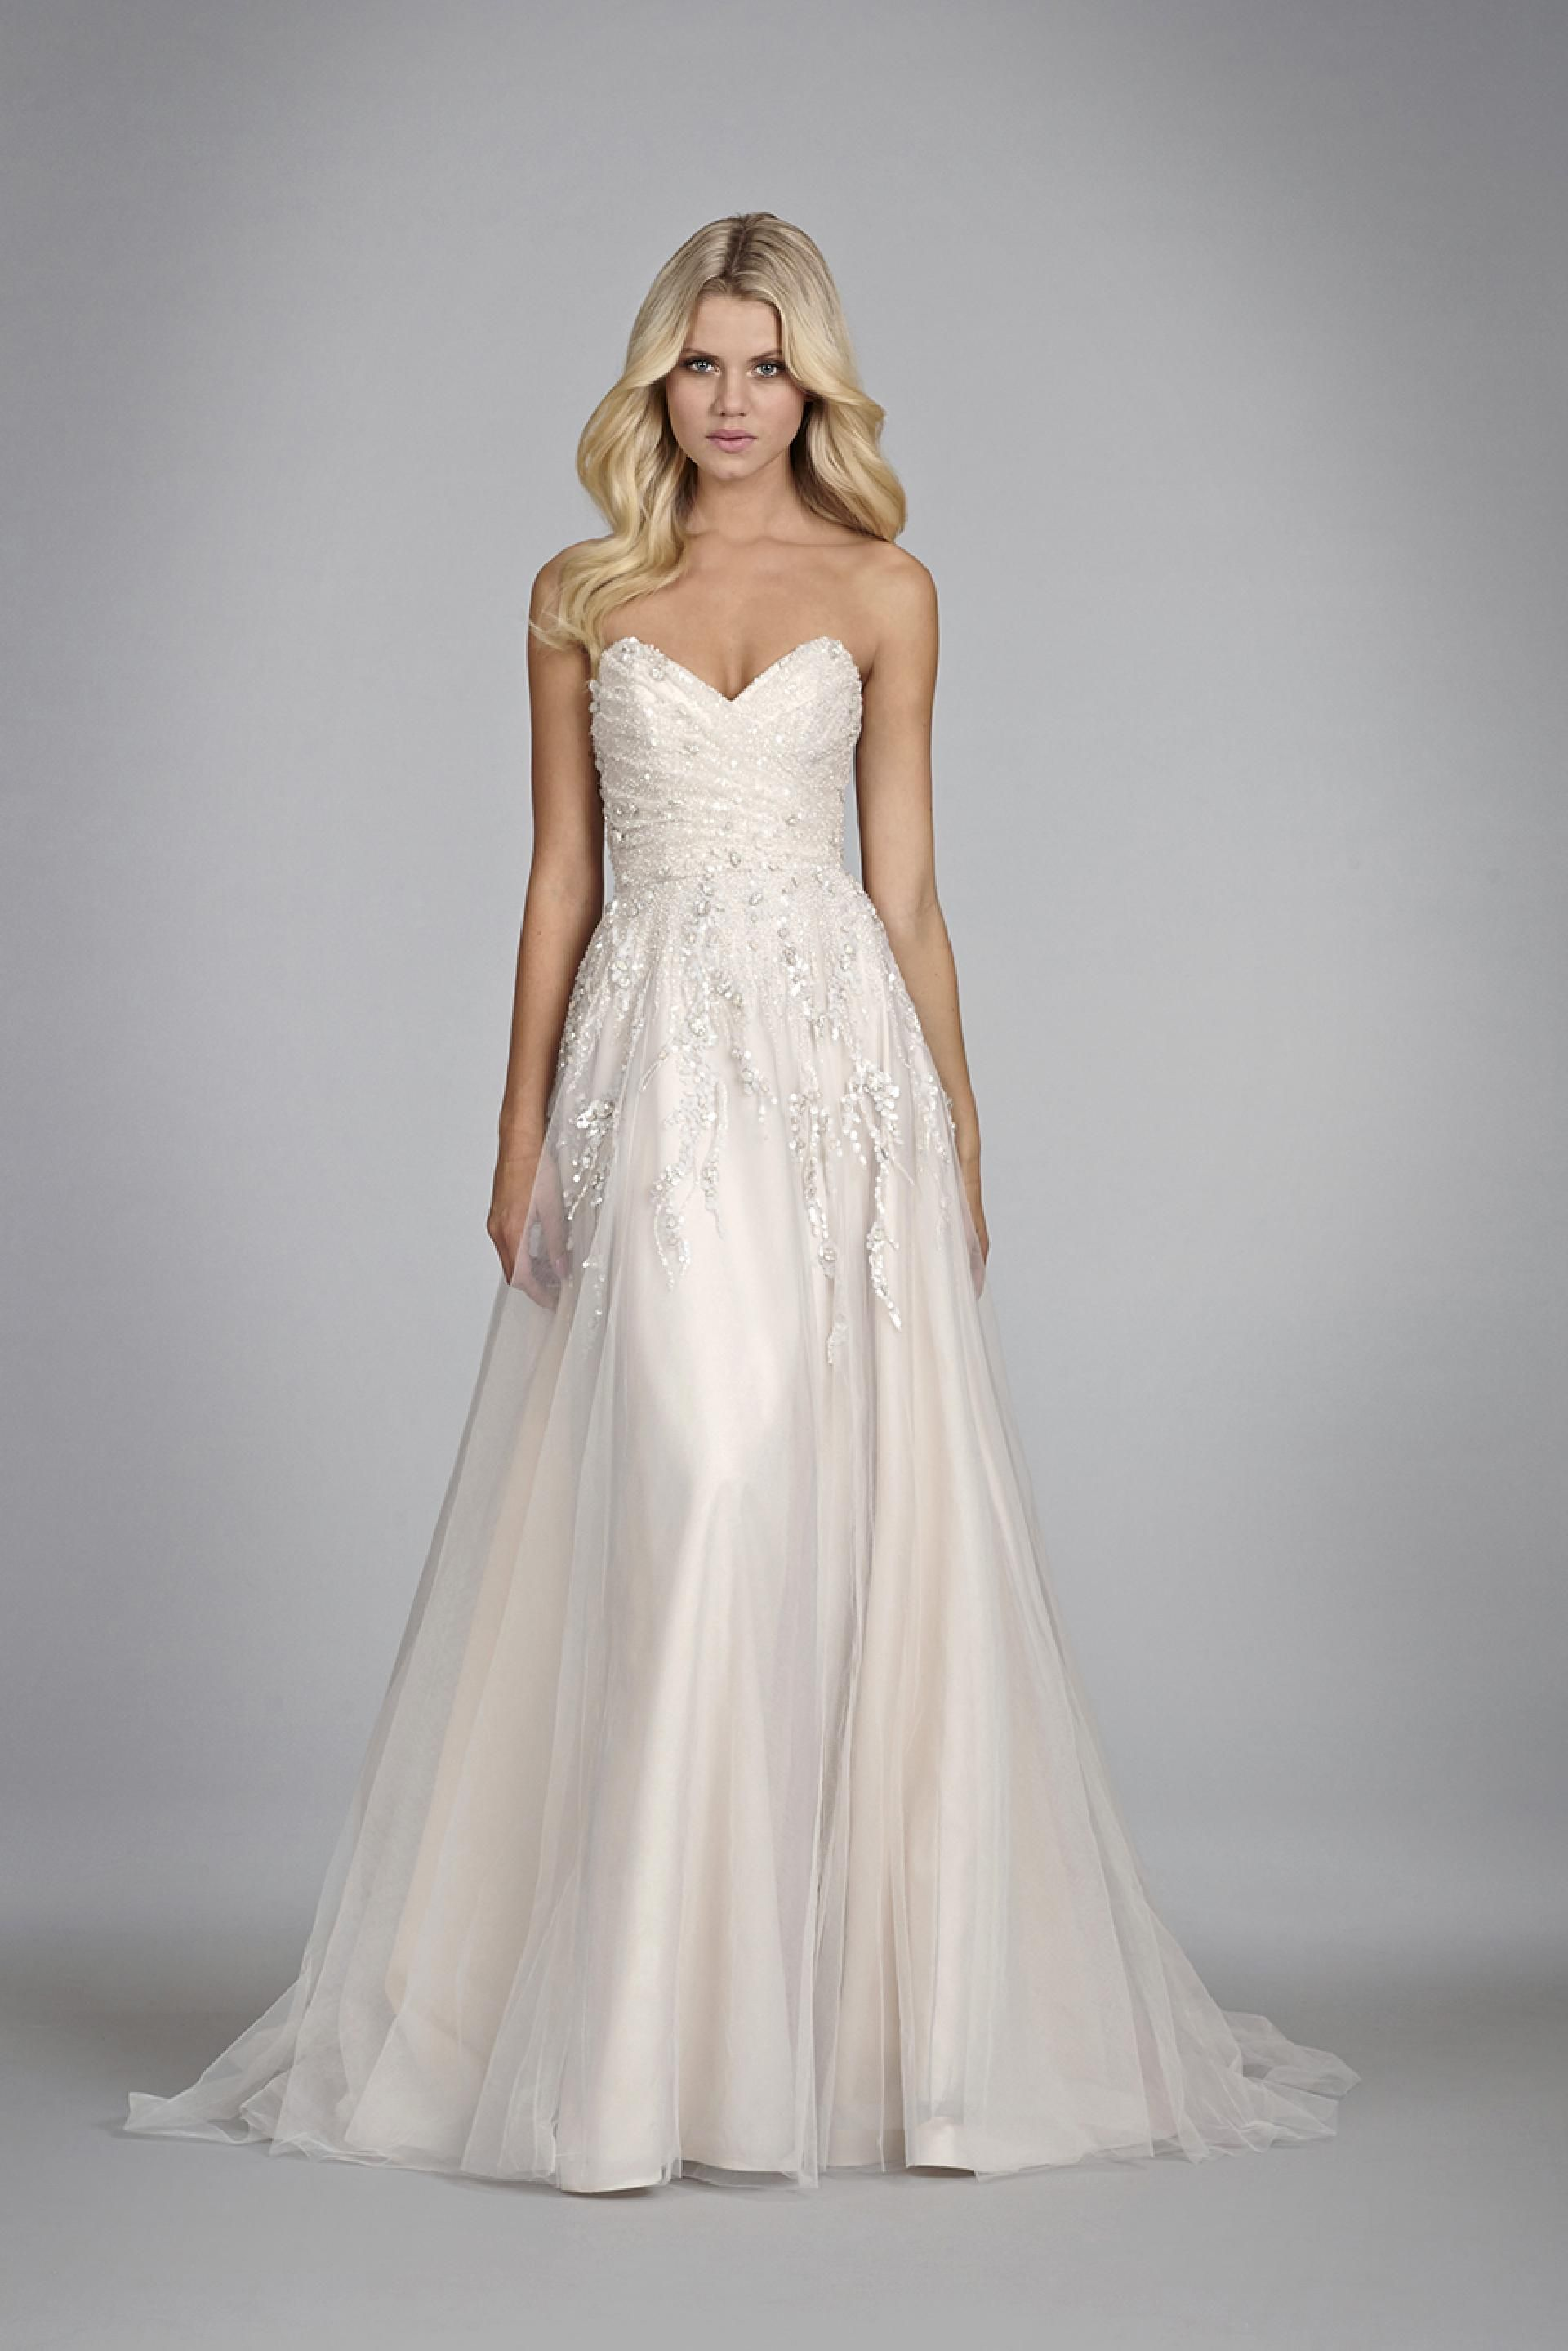 Alvina Valenta Wedding Dresses Charleston Bridal Shope Wedding Dresses Alvina Valenta Wedding Dresses Bridal Gown Styles [ 2878 x 1920 Pixel ]